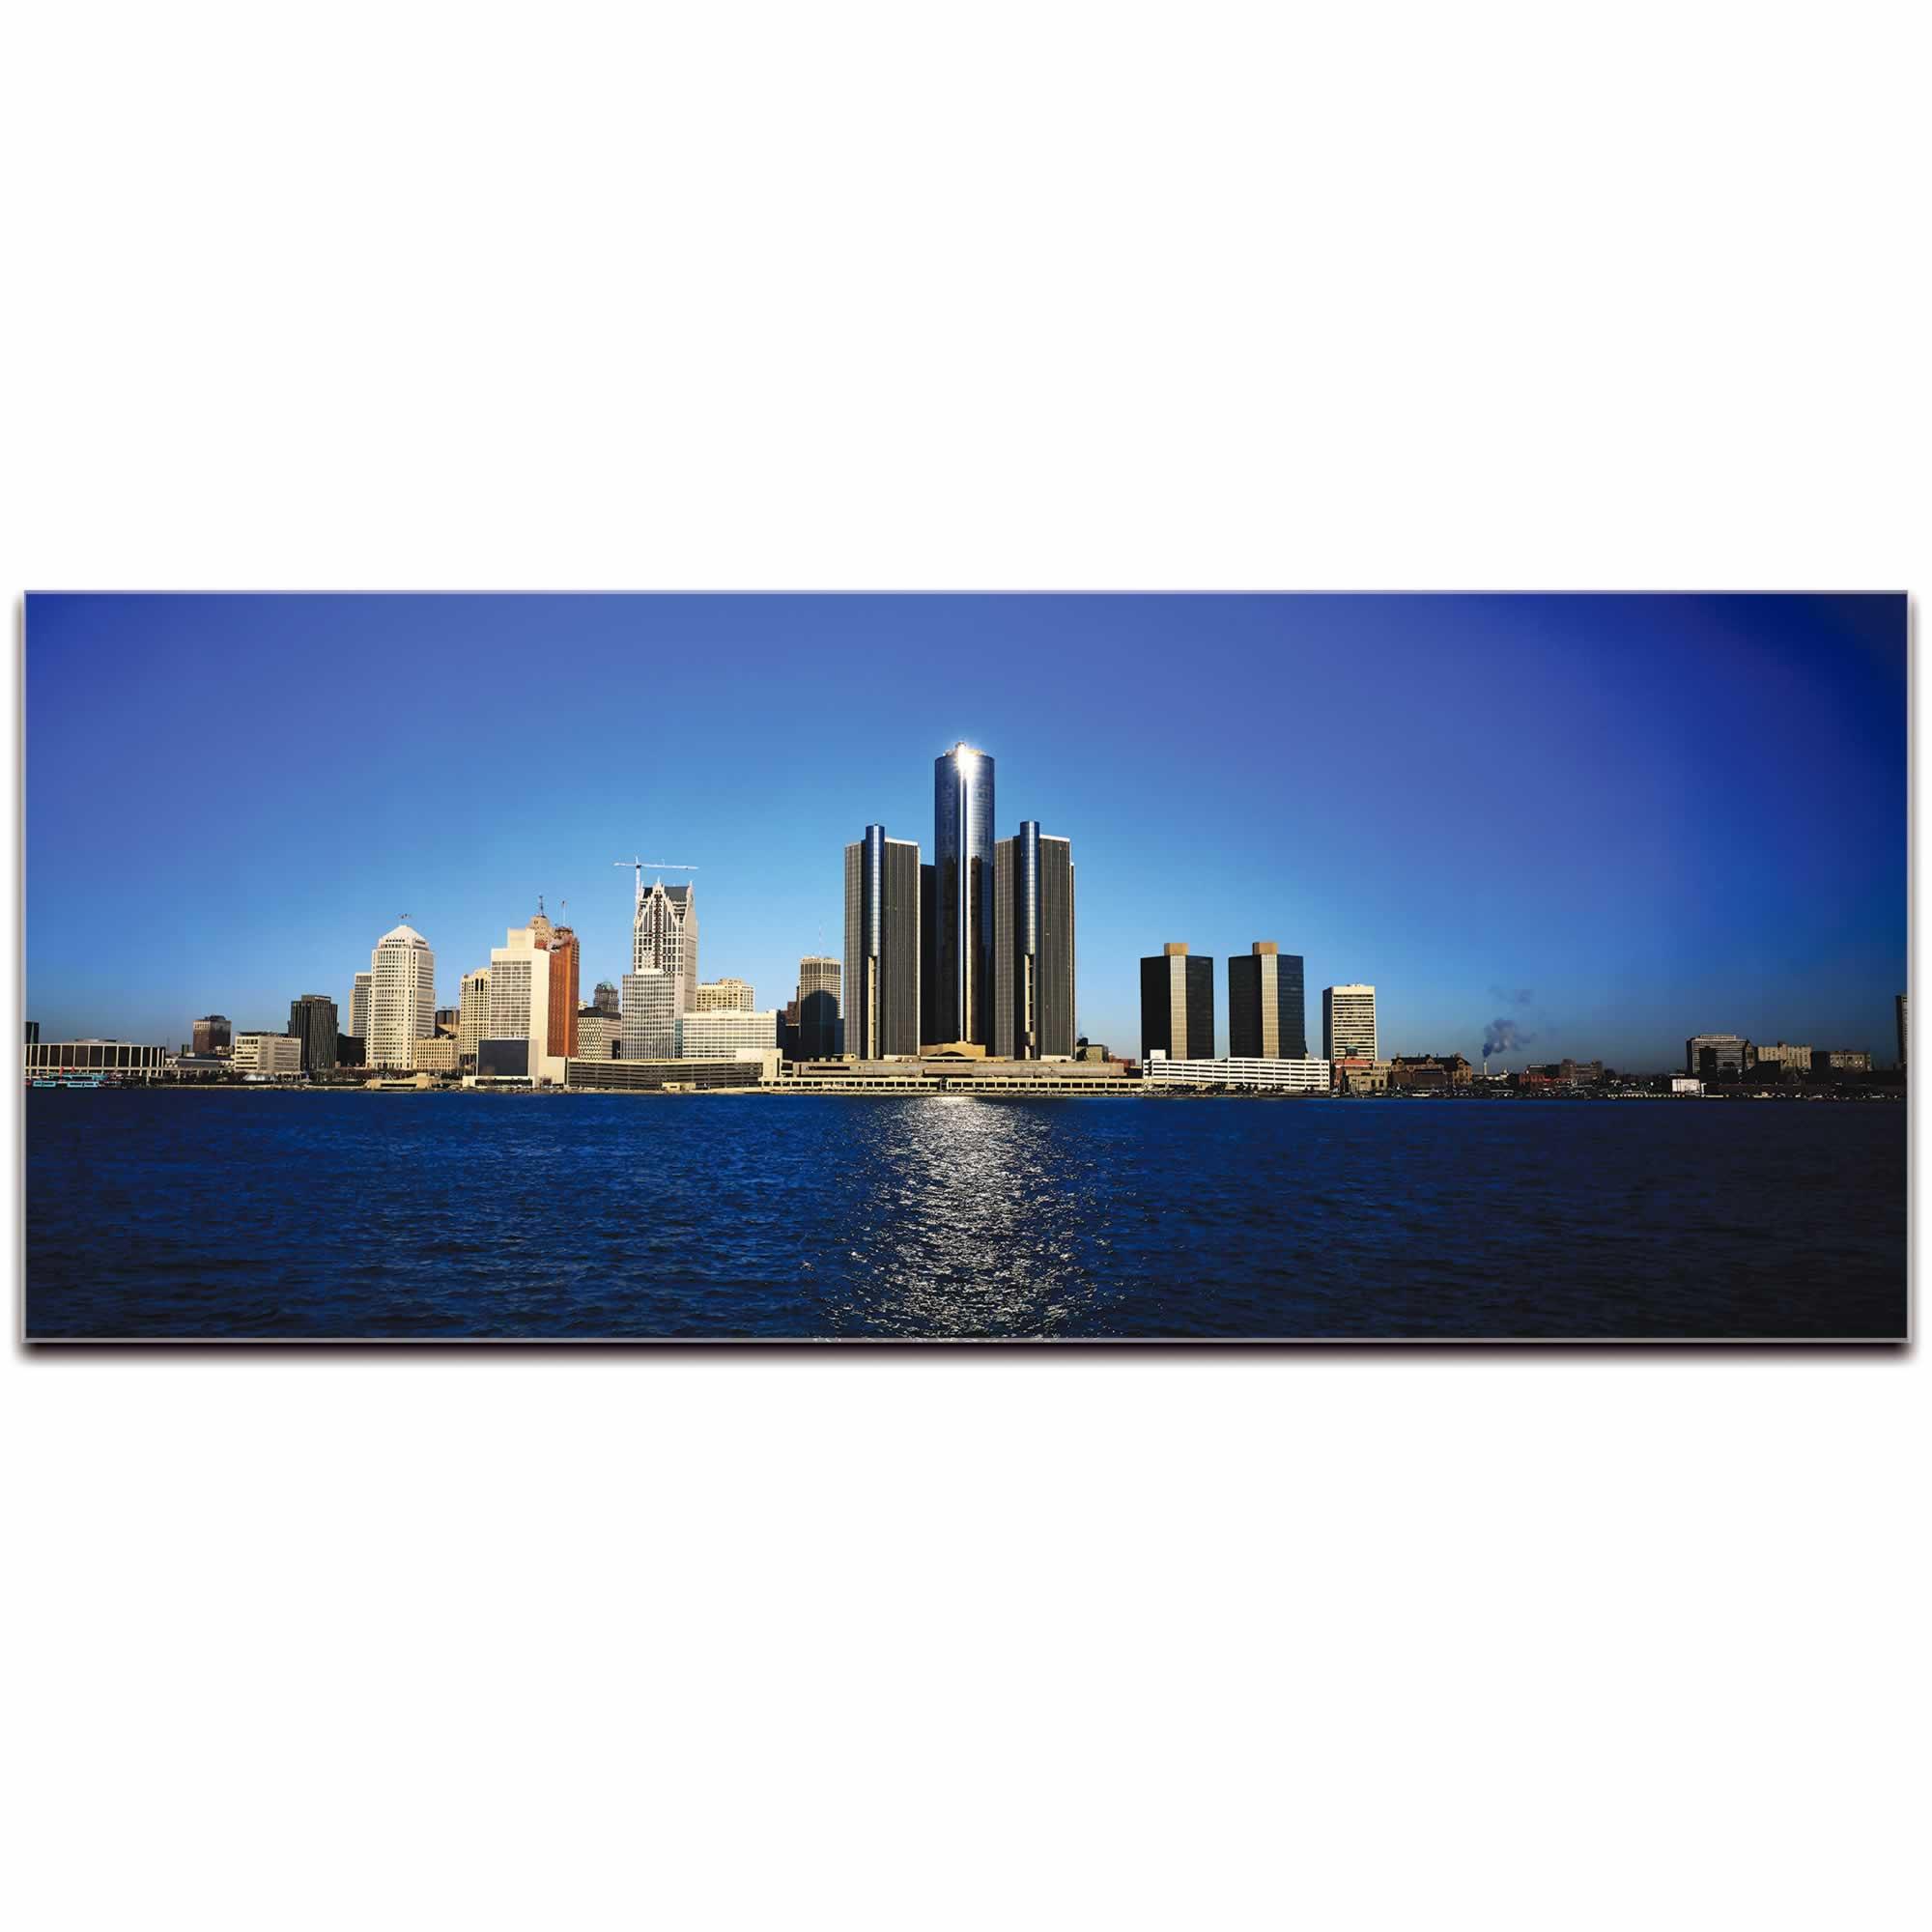 Detroit City Skyline - Urban Modern Art, Designer Home Decor, Cityscape Wall Artwork, Trendy Contemporary Art